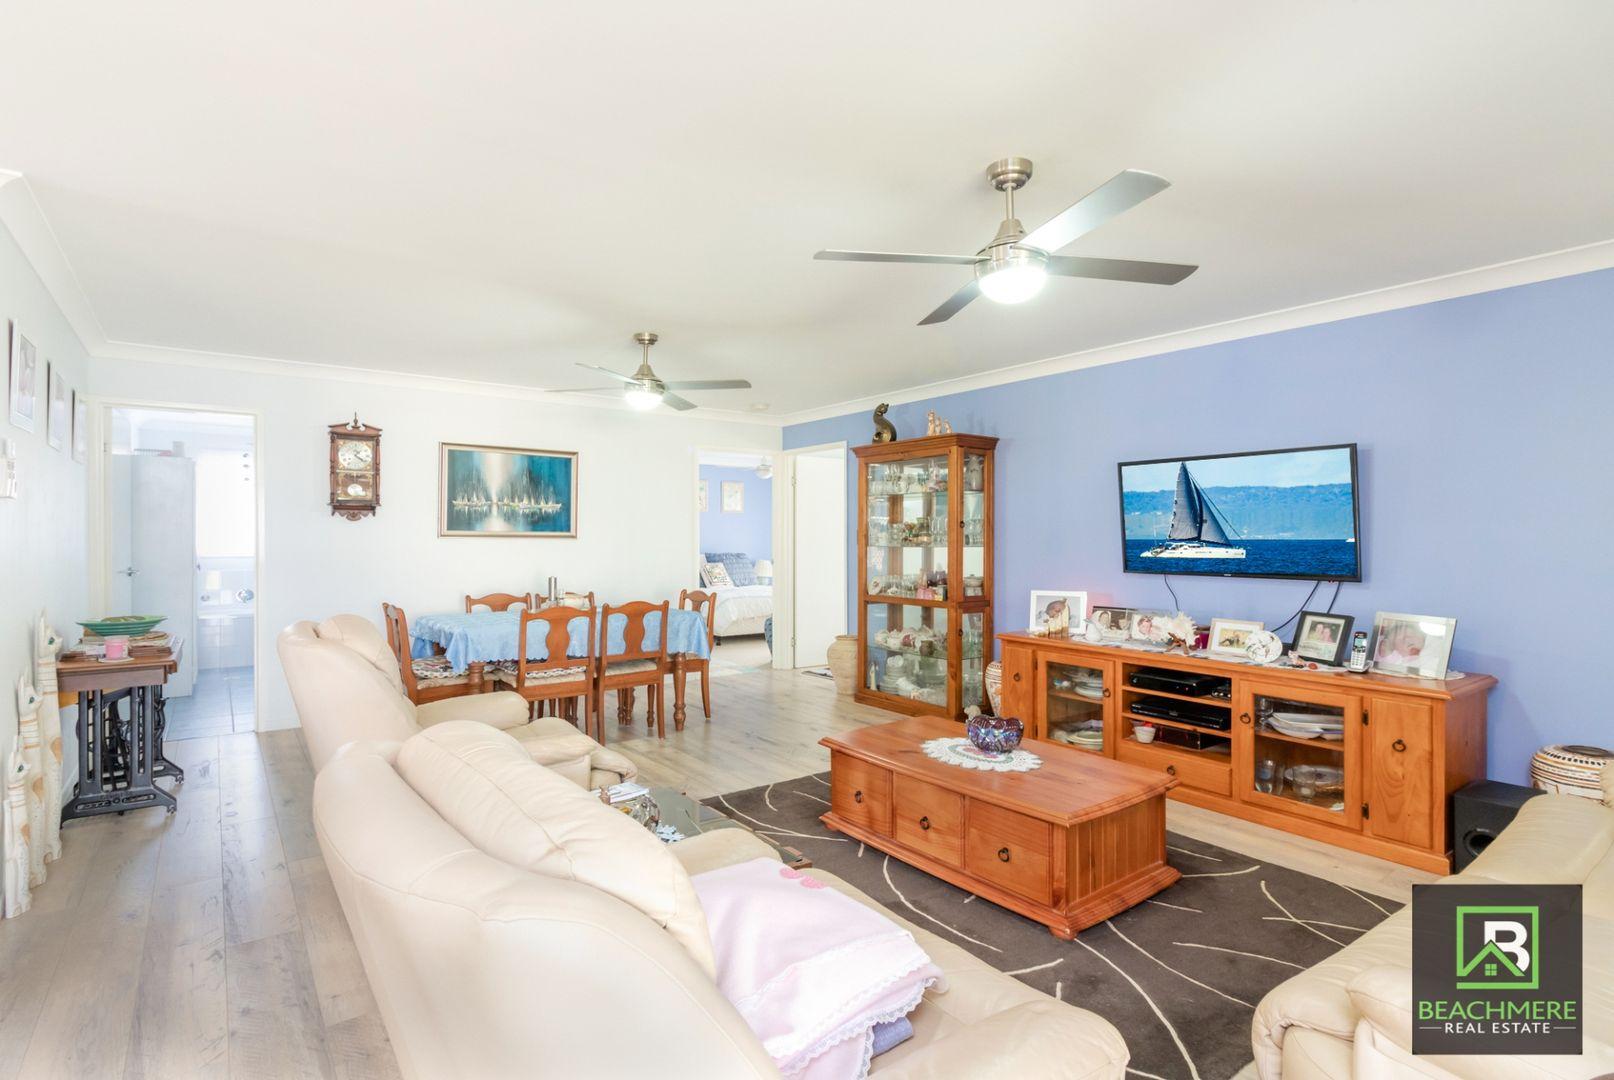 24 Weeroona Avenue, Beachmere QLD 4510, Image 2